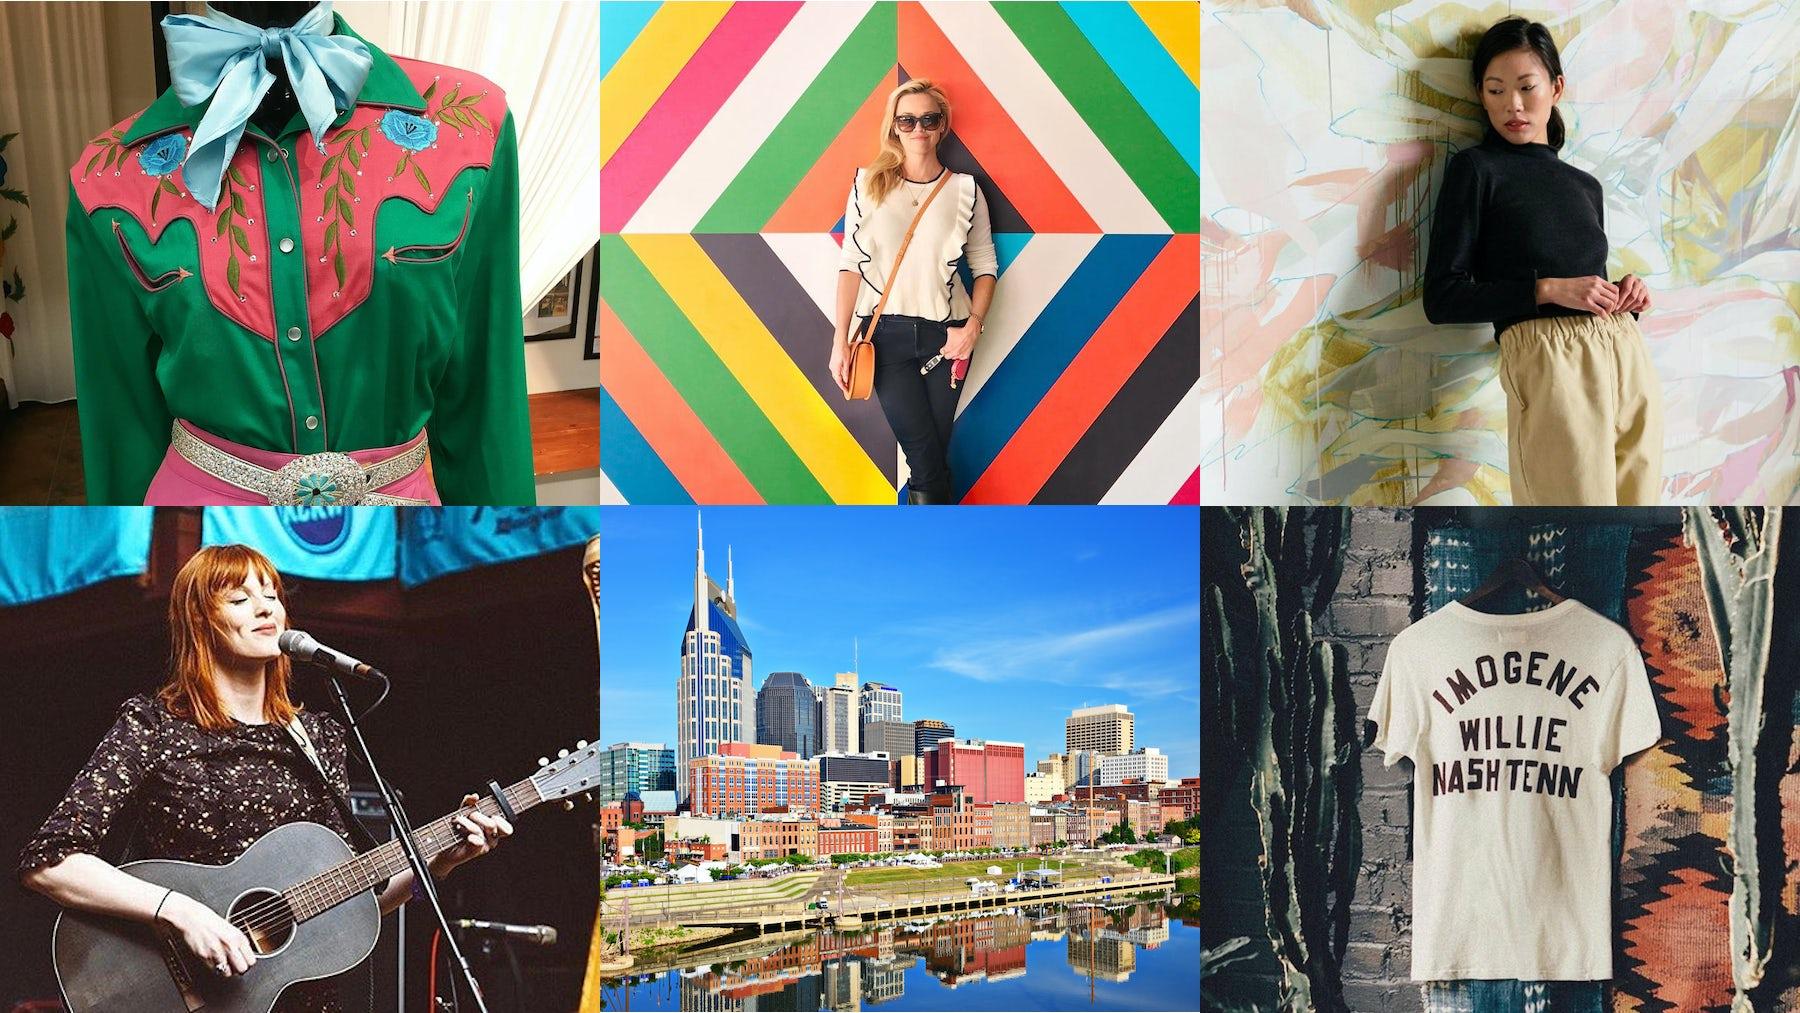 Source: [Clockwise from top left] Instagram/@manuelcouture, @reesewitherspoon, @elizsuzann, @misskarenelson, Shutterstock, Instagram/@imogeneandwillie